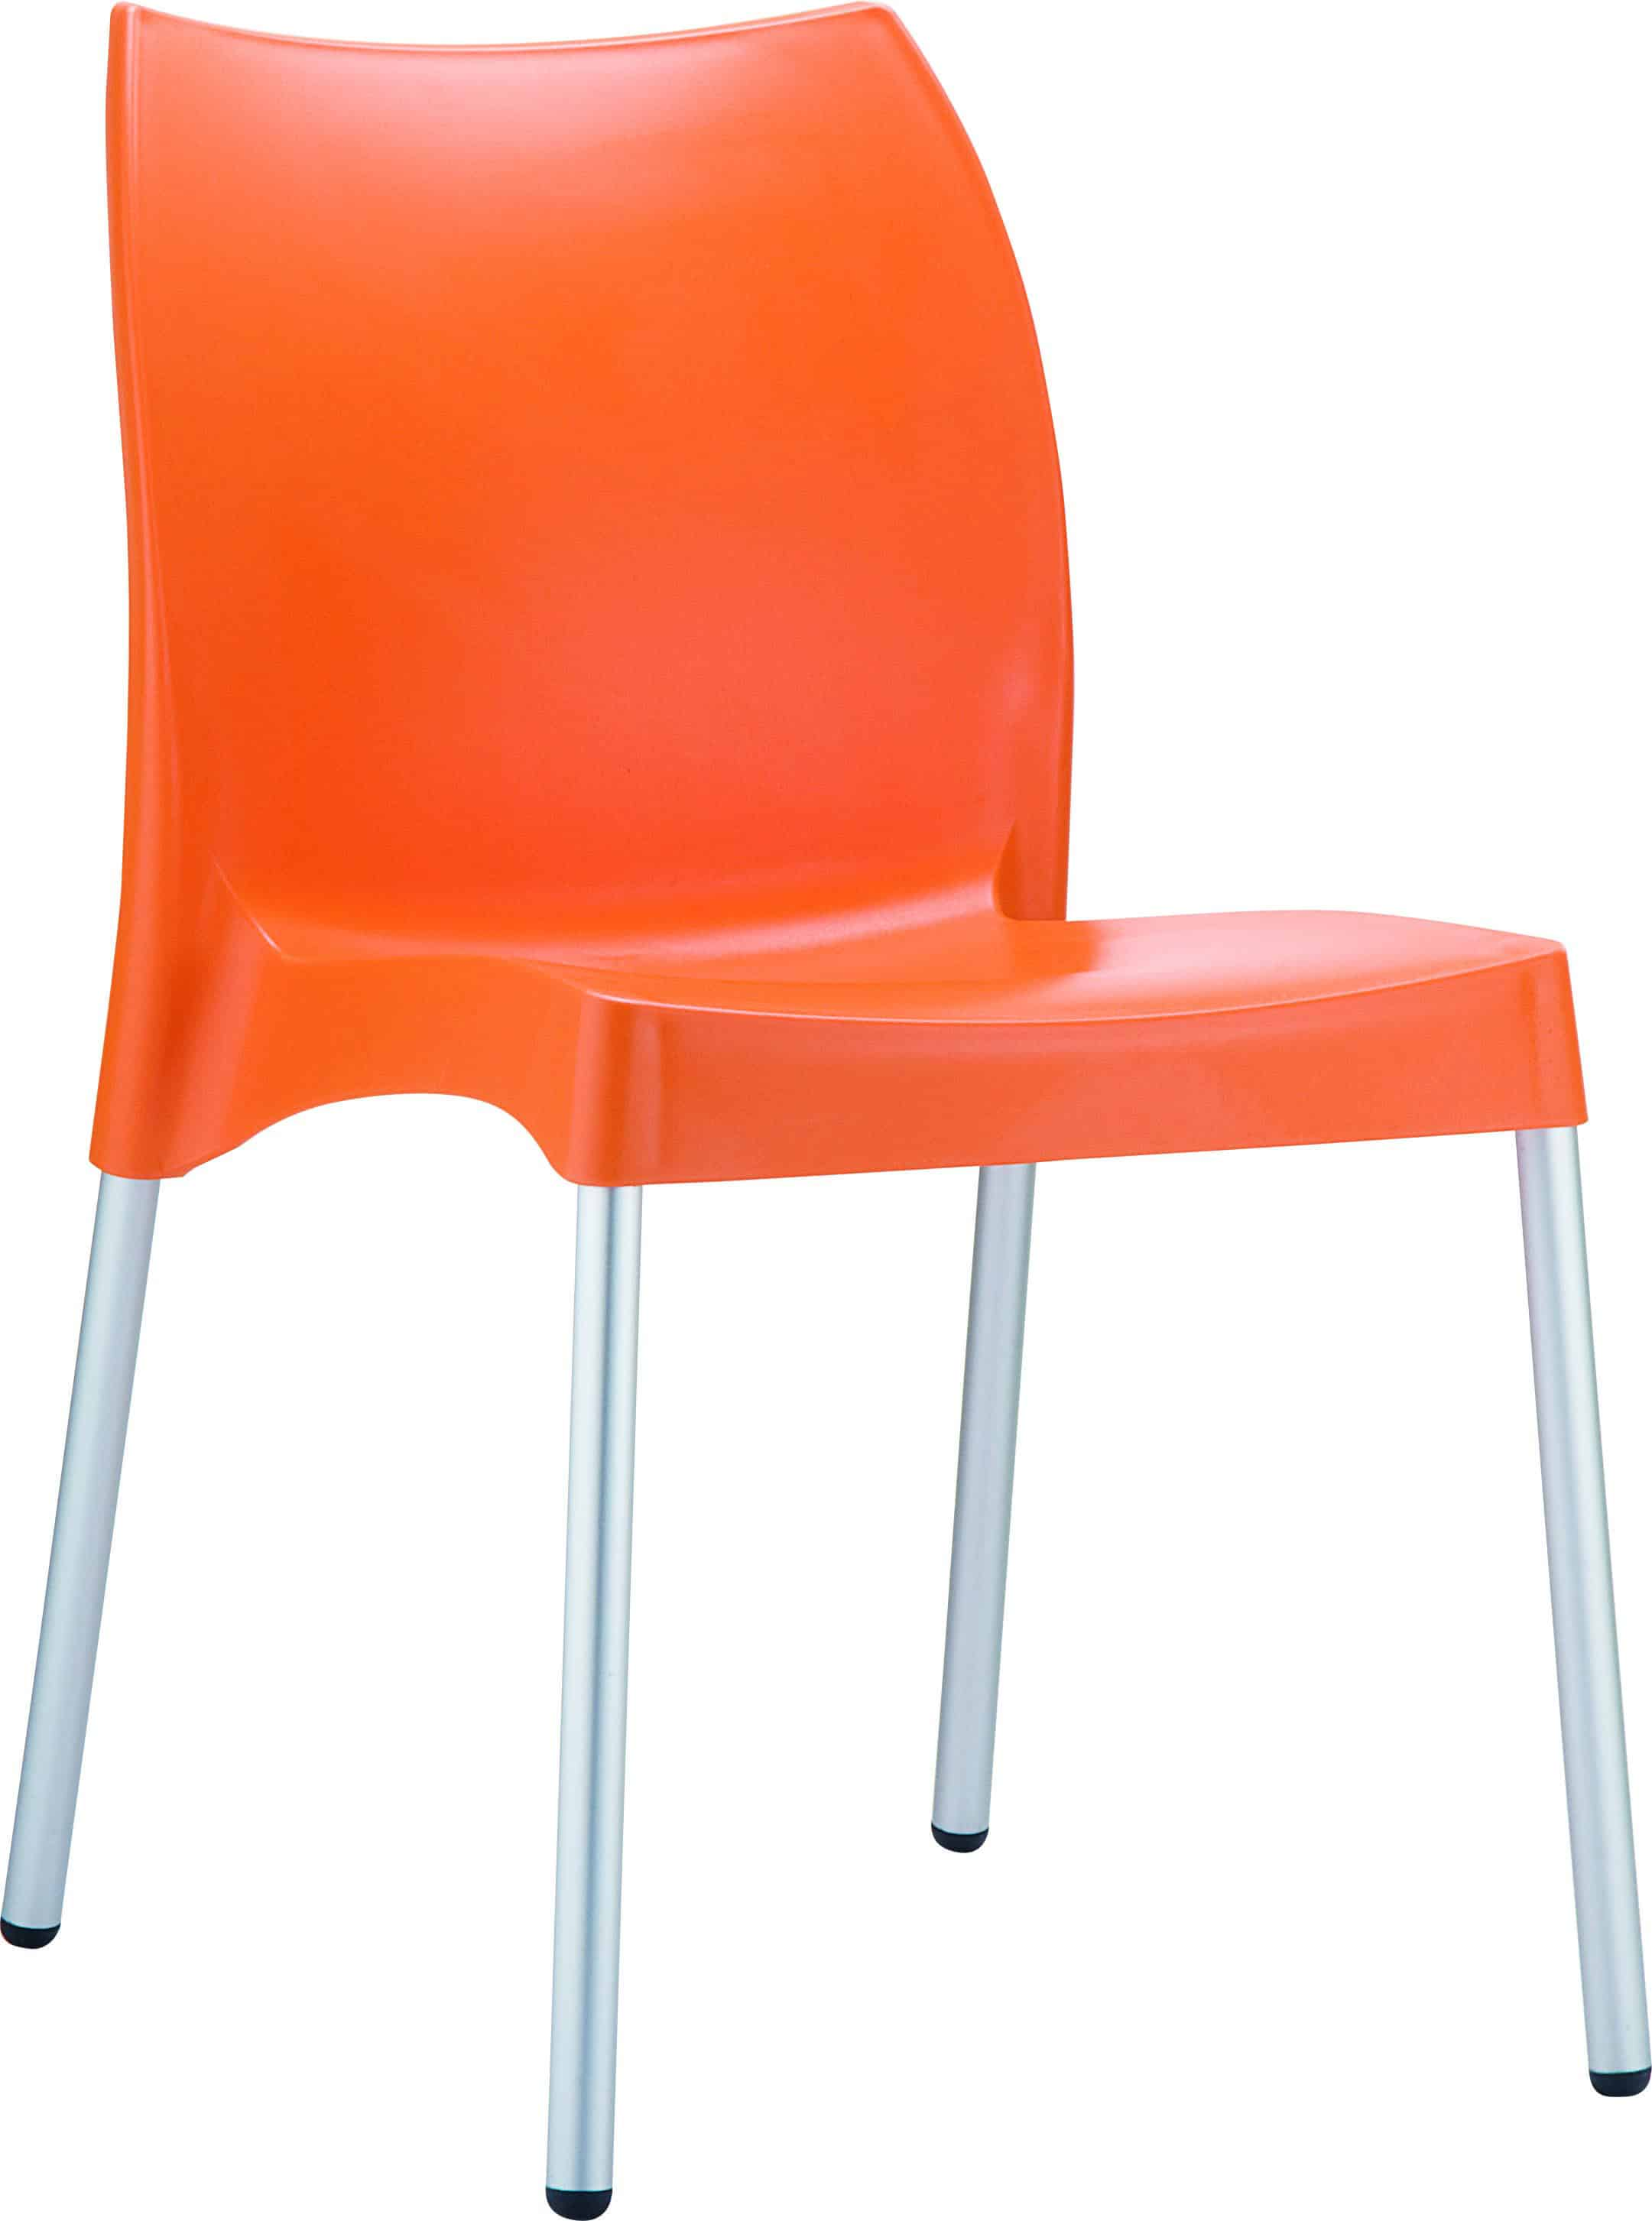 Orange Astray office chair